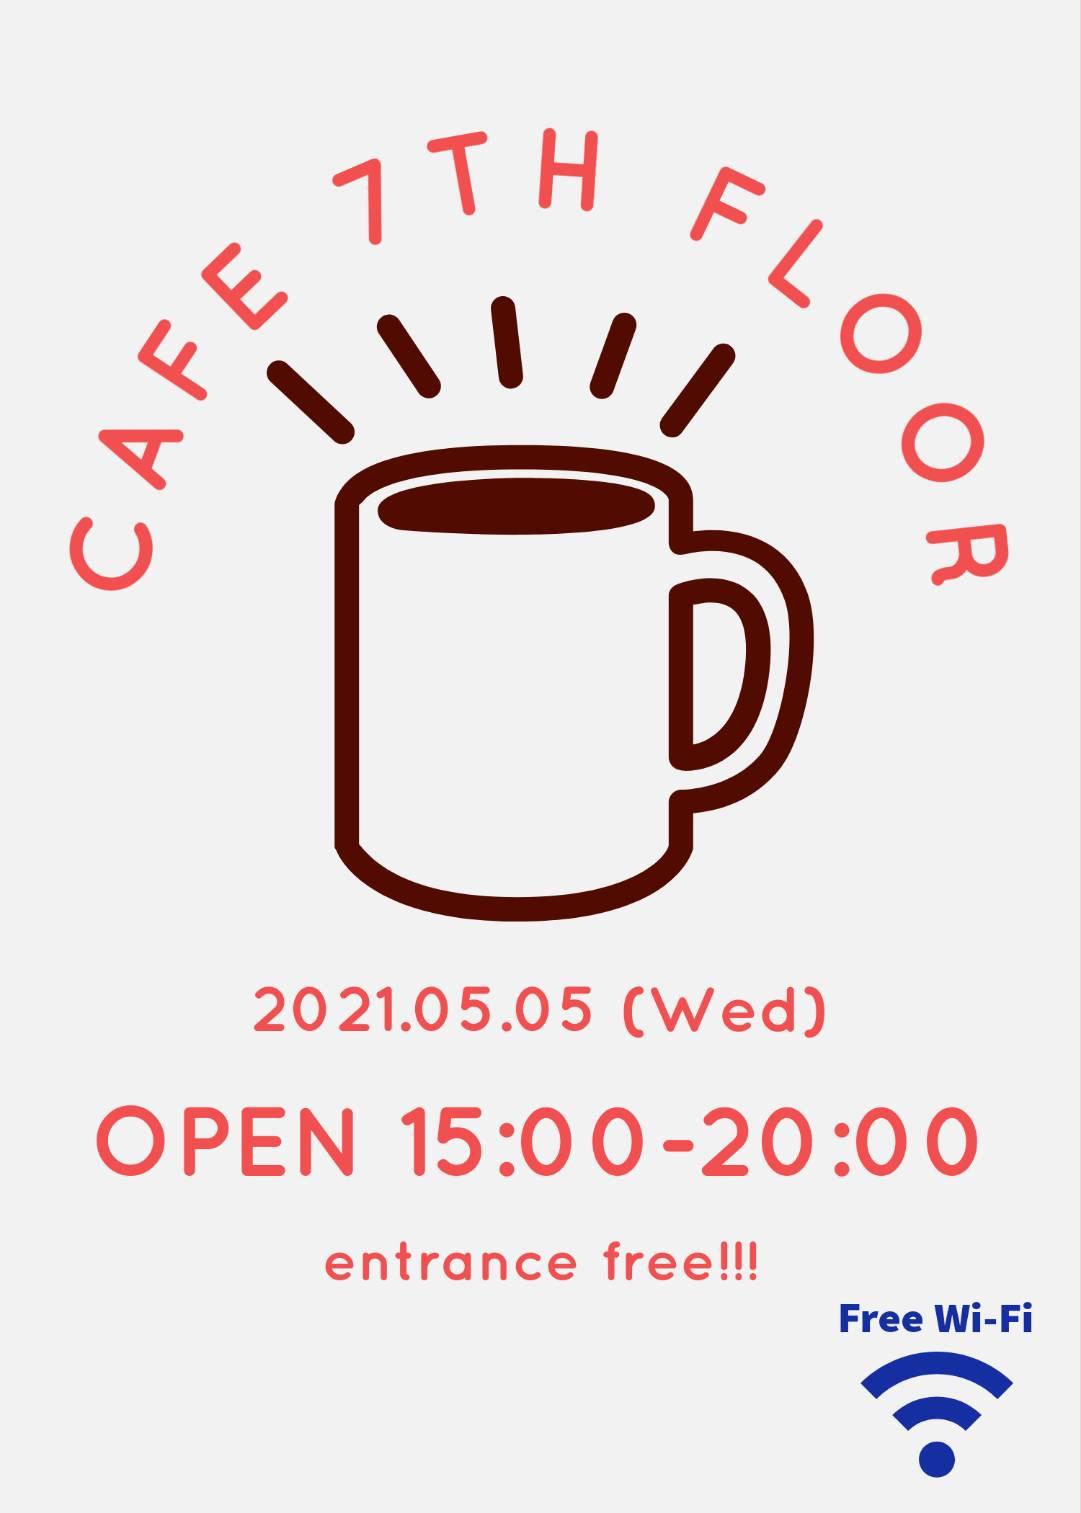 CAFE 7TH FLOOR